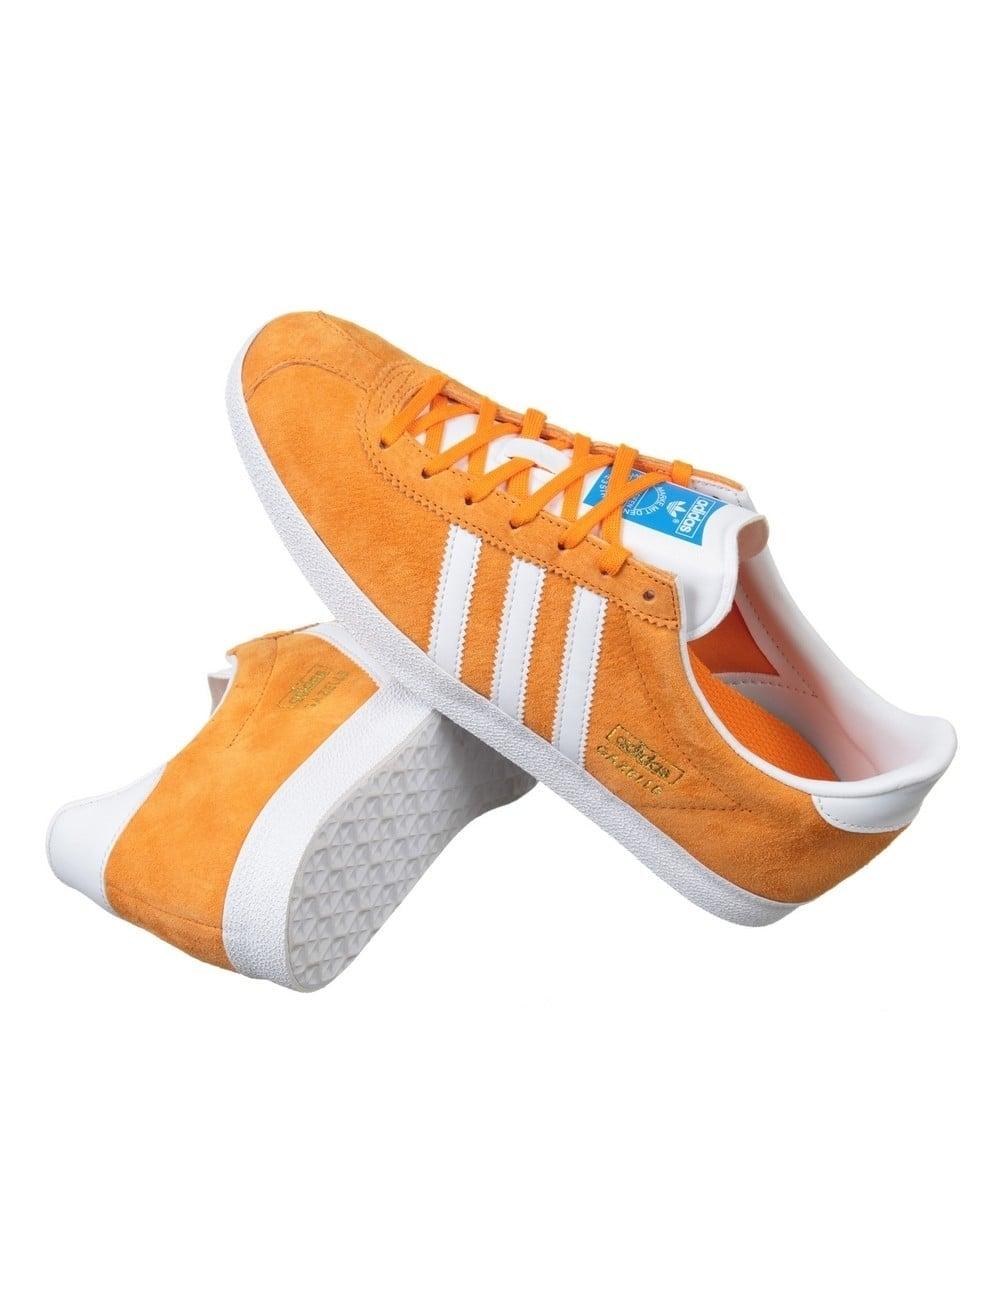 premier taux 2c405 86f6a Gazelle OG Shoes - Bright Orange